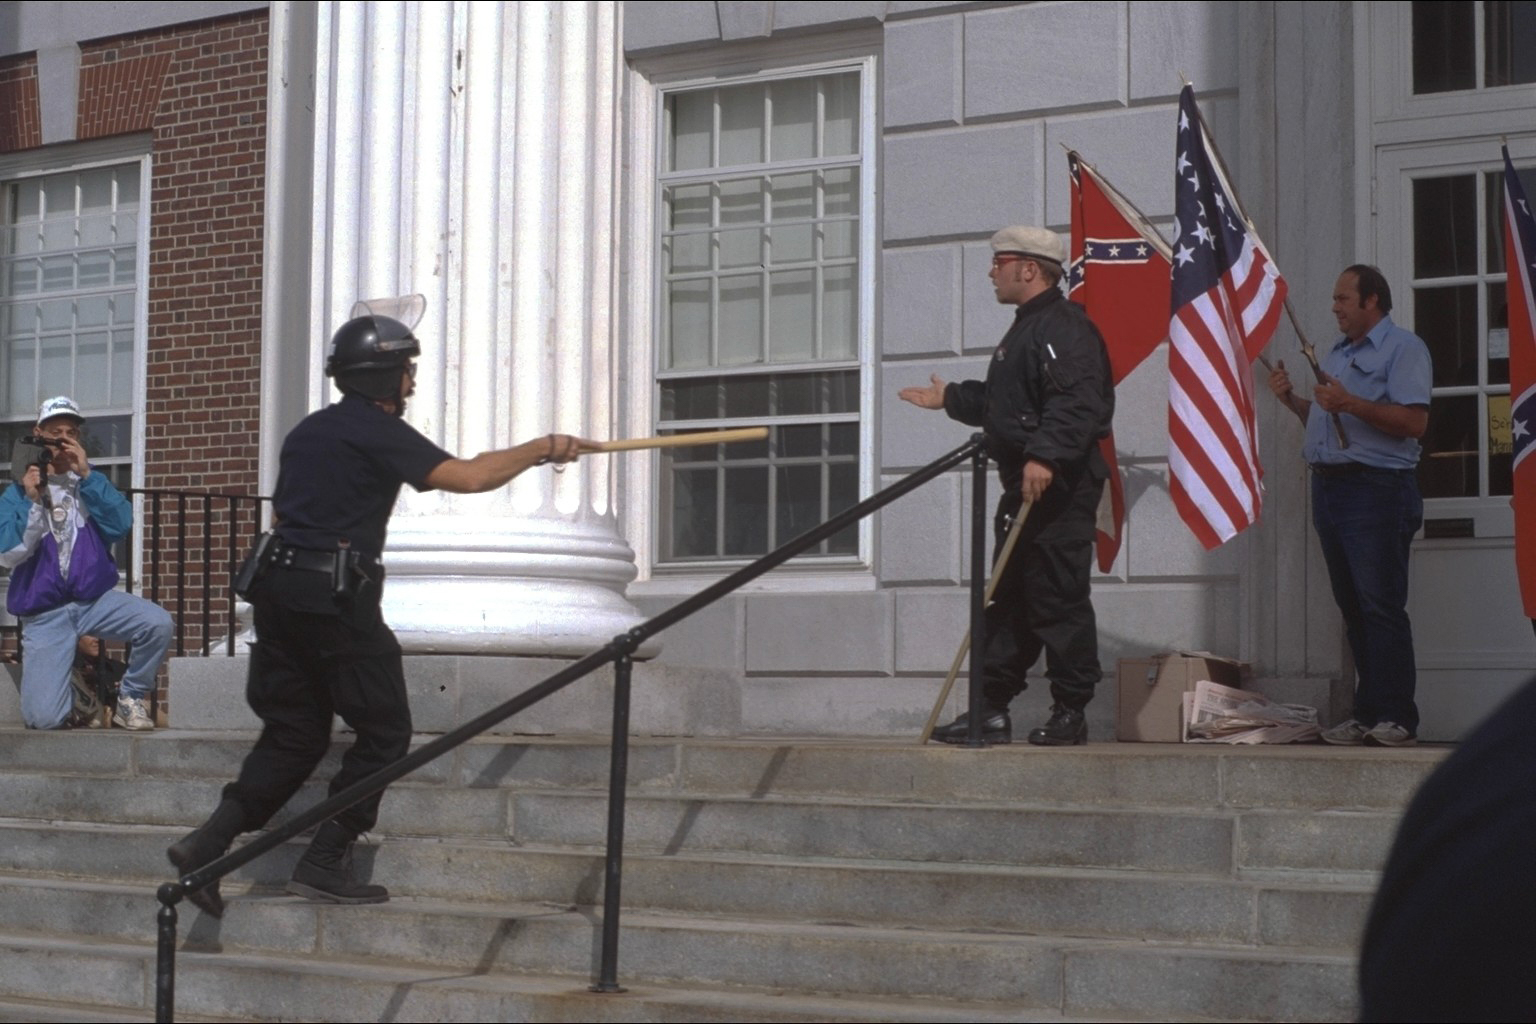 Racists_06.jpg